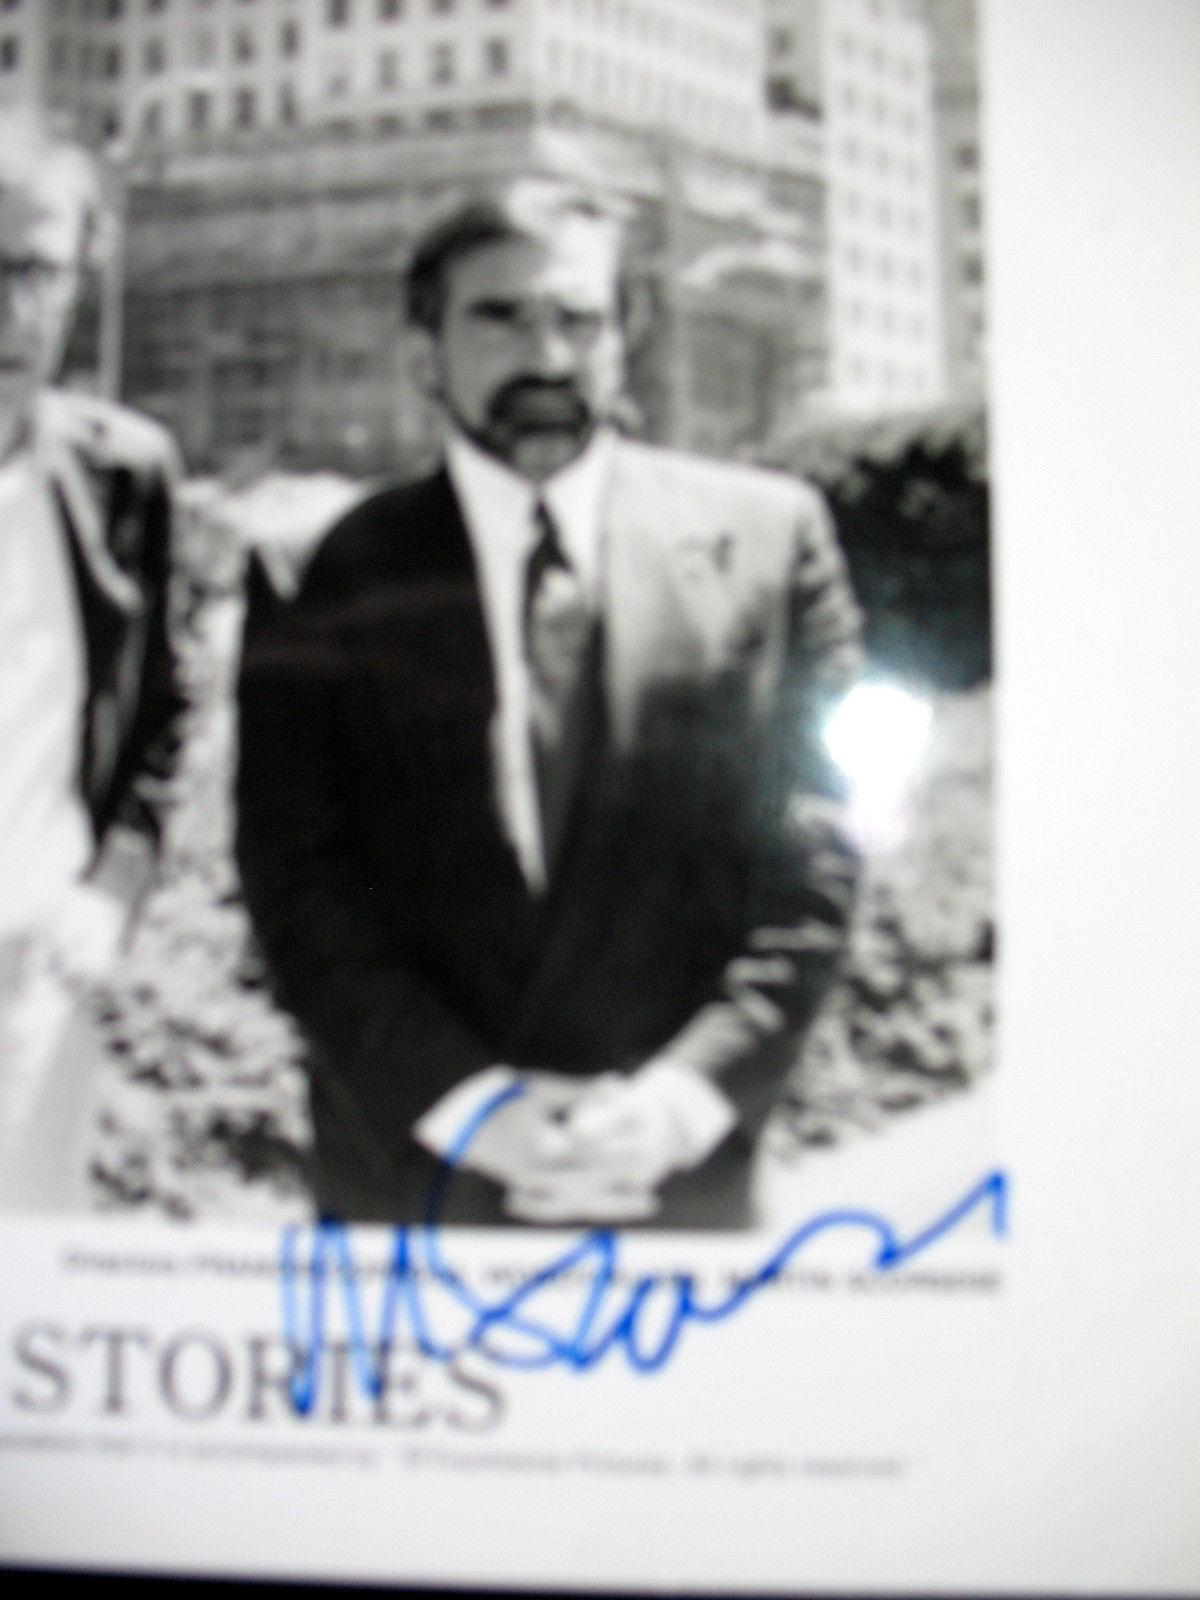 MARTIN SCORSESE (NEW YORK STORYS) ORIGINAL SIGN AUTOGRAPH PHOTO (CLASSIC)